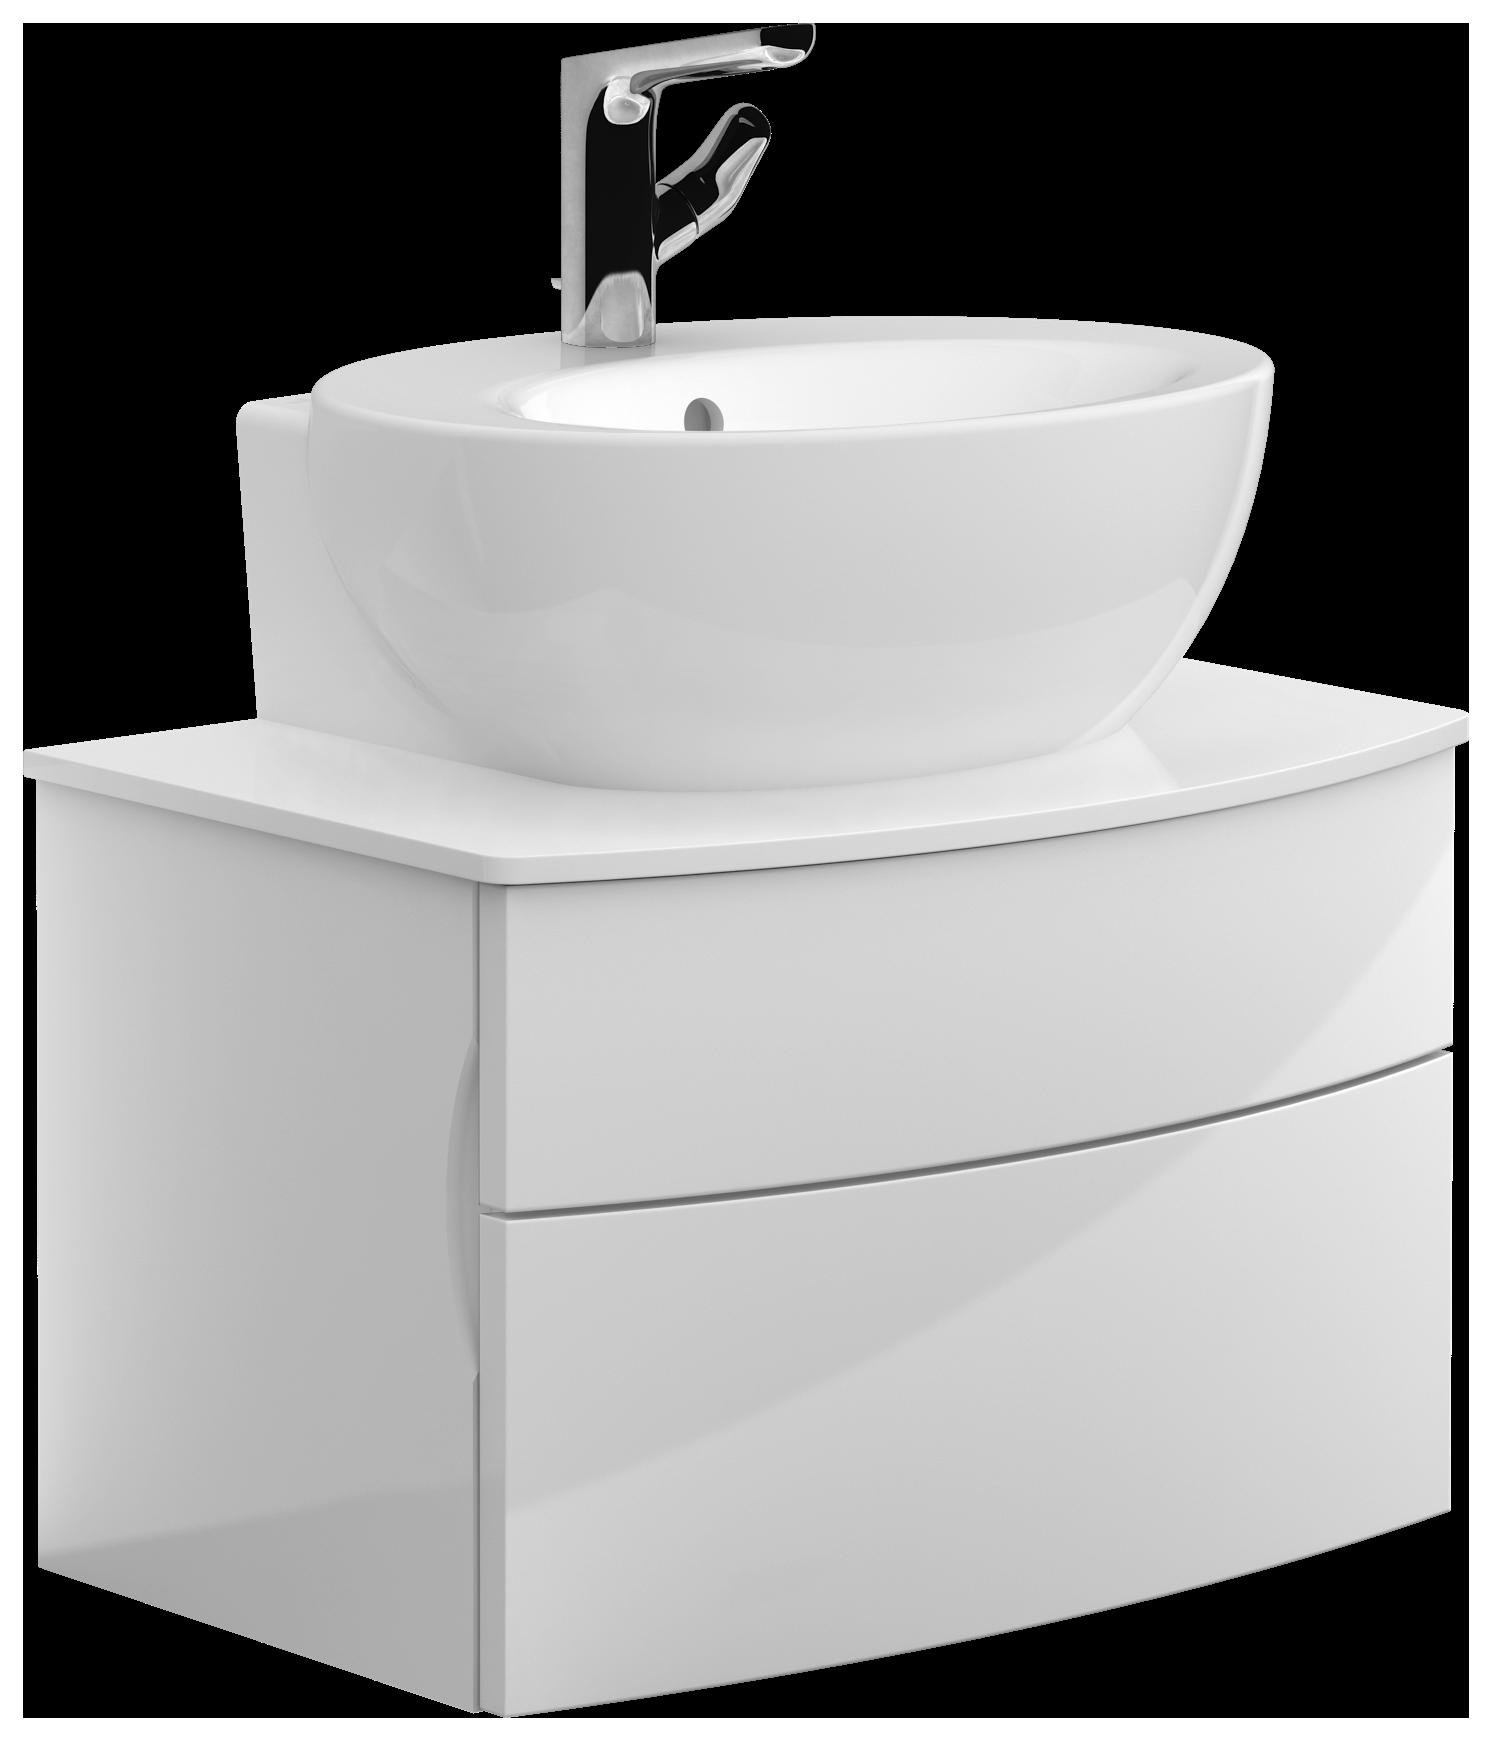 bathroom sink cabinets. Aveo New Generation Bathroom Furniture, Vanity Unit For Washbasin, Sink Cabinets T